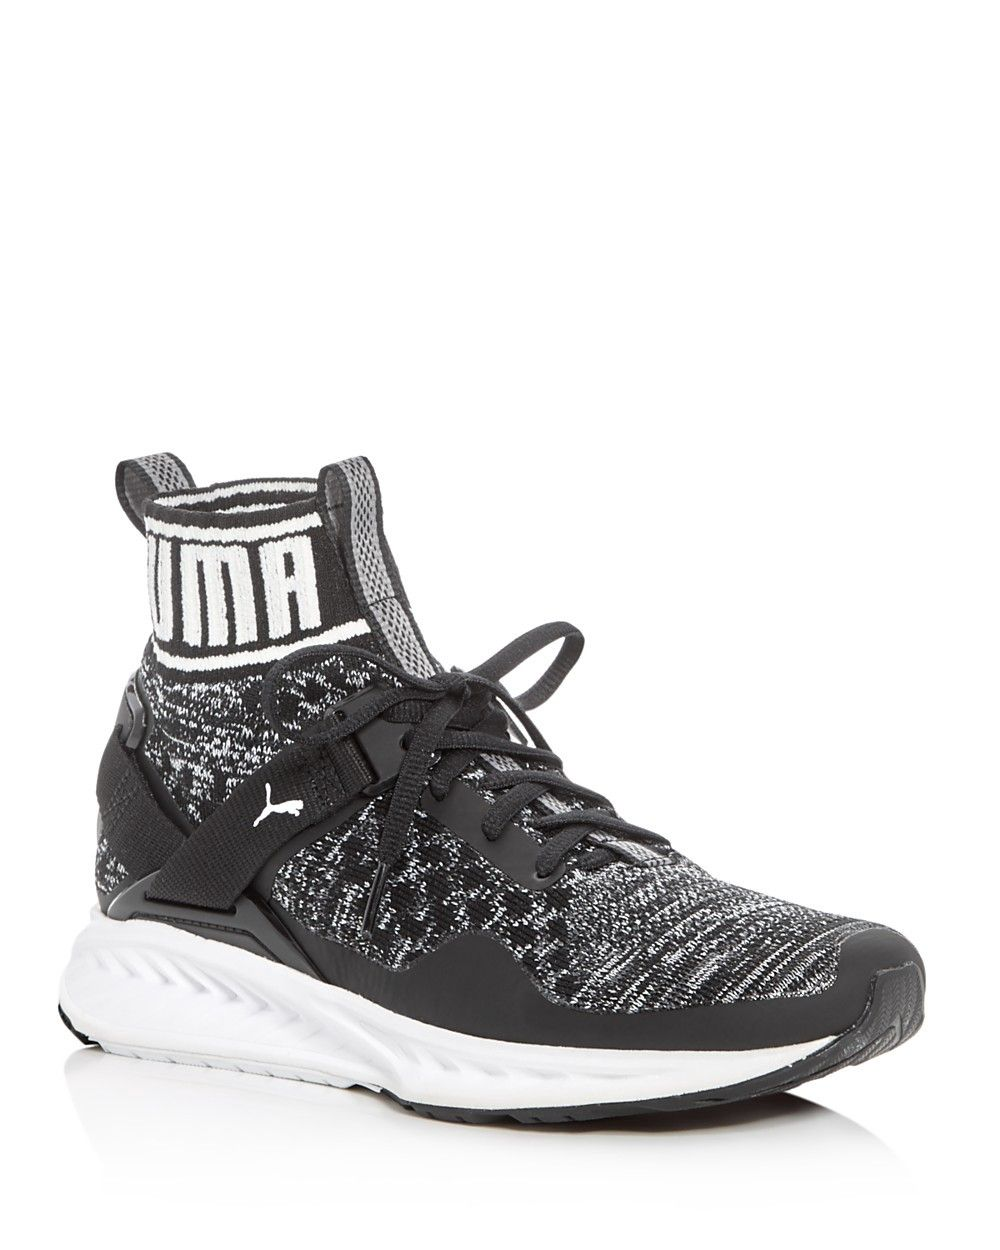 PUMA PUMA Women s Ignite Evoknit High Top Sneakers.  puma  shoes  all d10ba5b2d